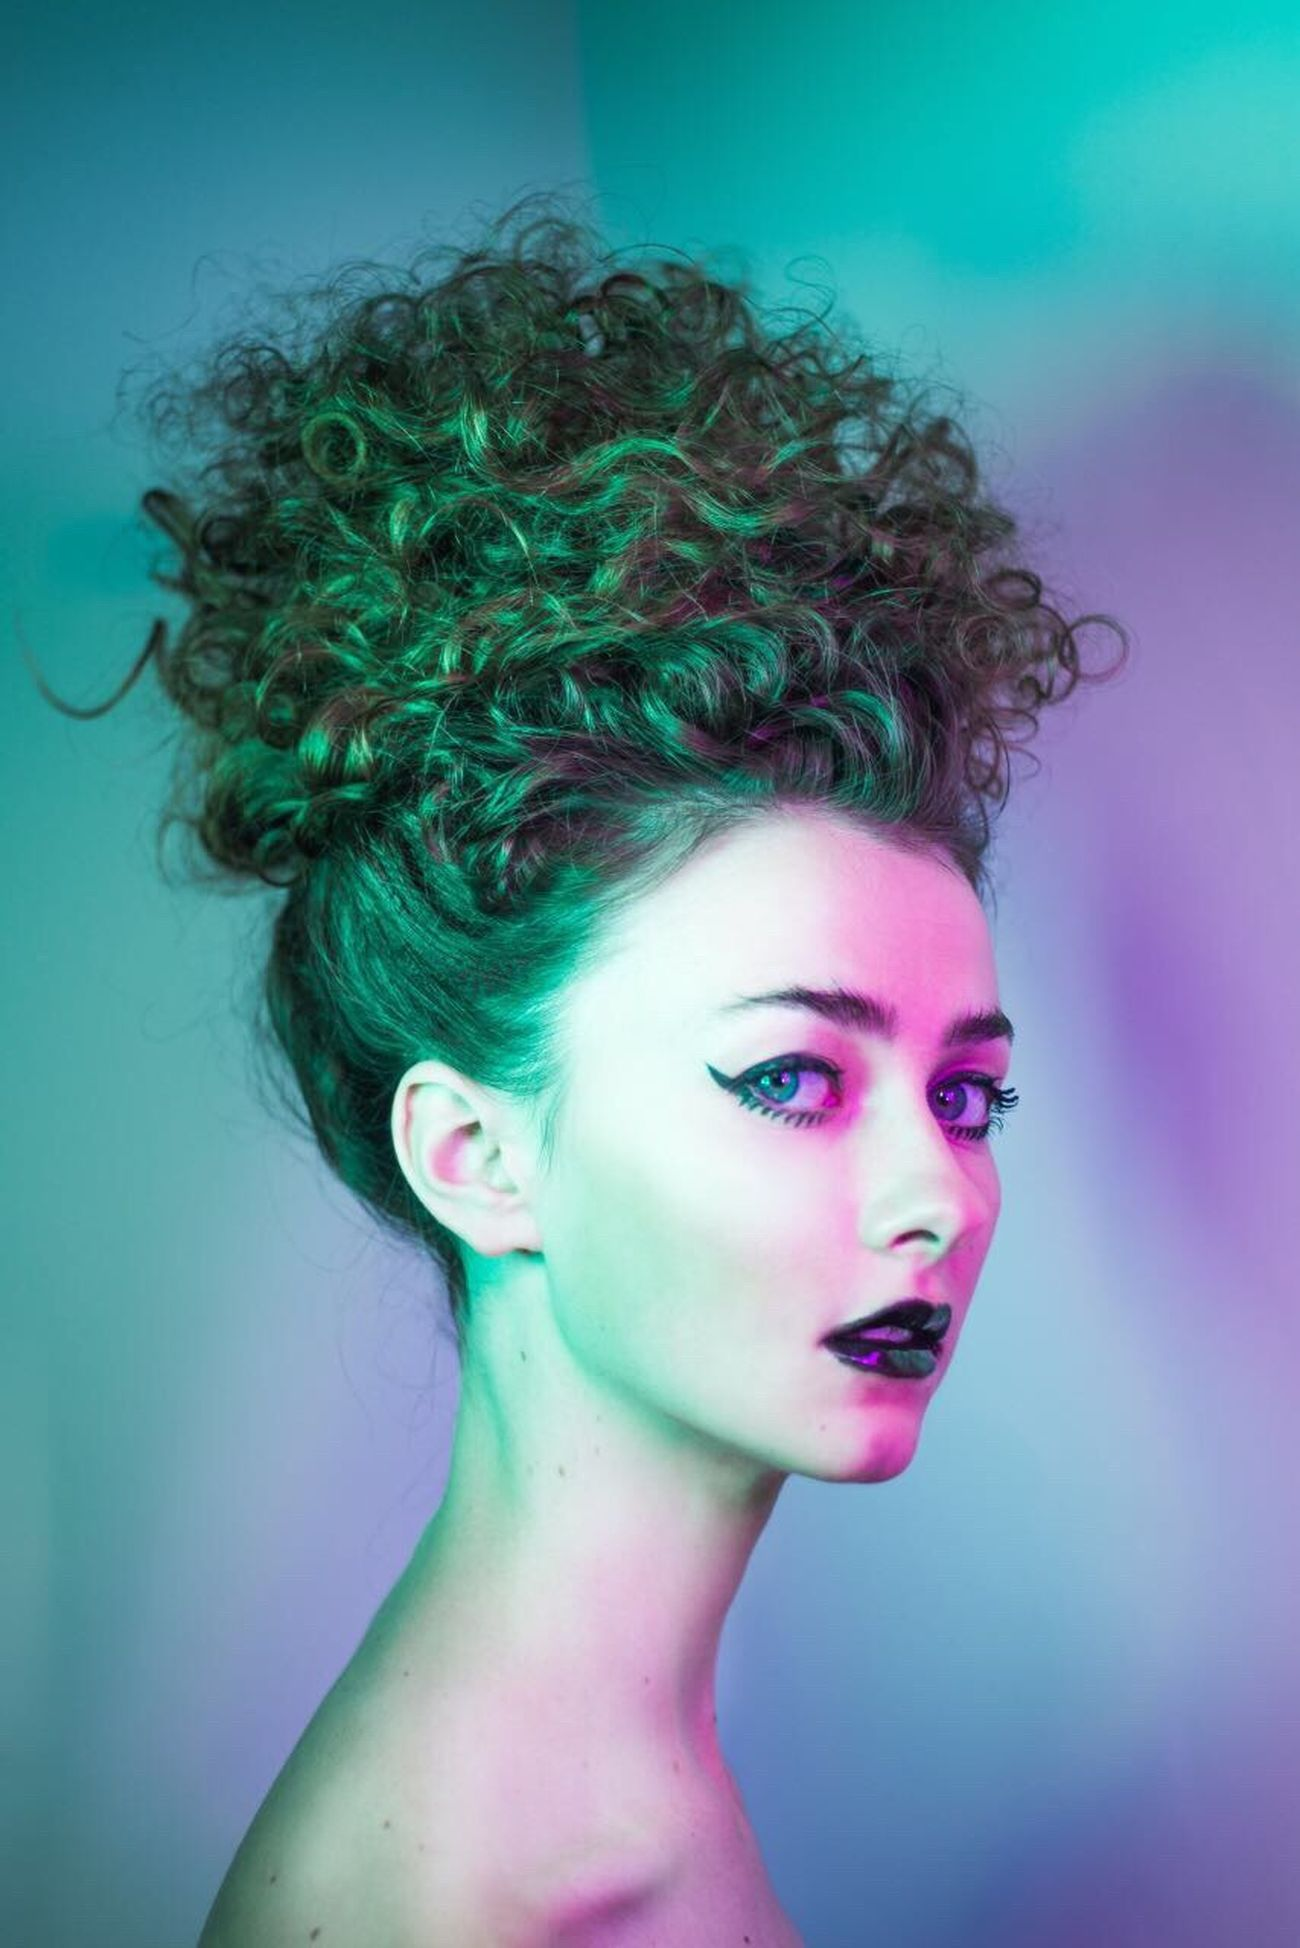 Fashion Beautiful People Beauty Portrait Studio Shot Make-up Beautiful Woman Young Adult Curly Hair Studio Fashion Neon Make-up This Week On Eyeem